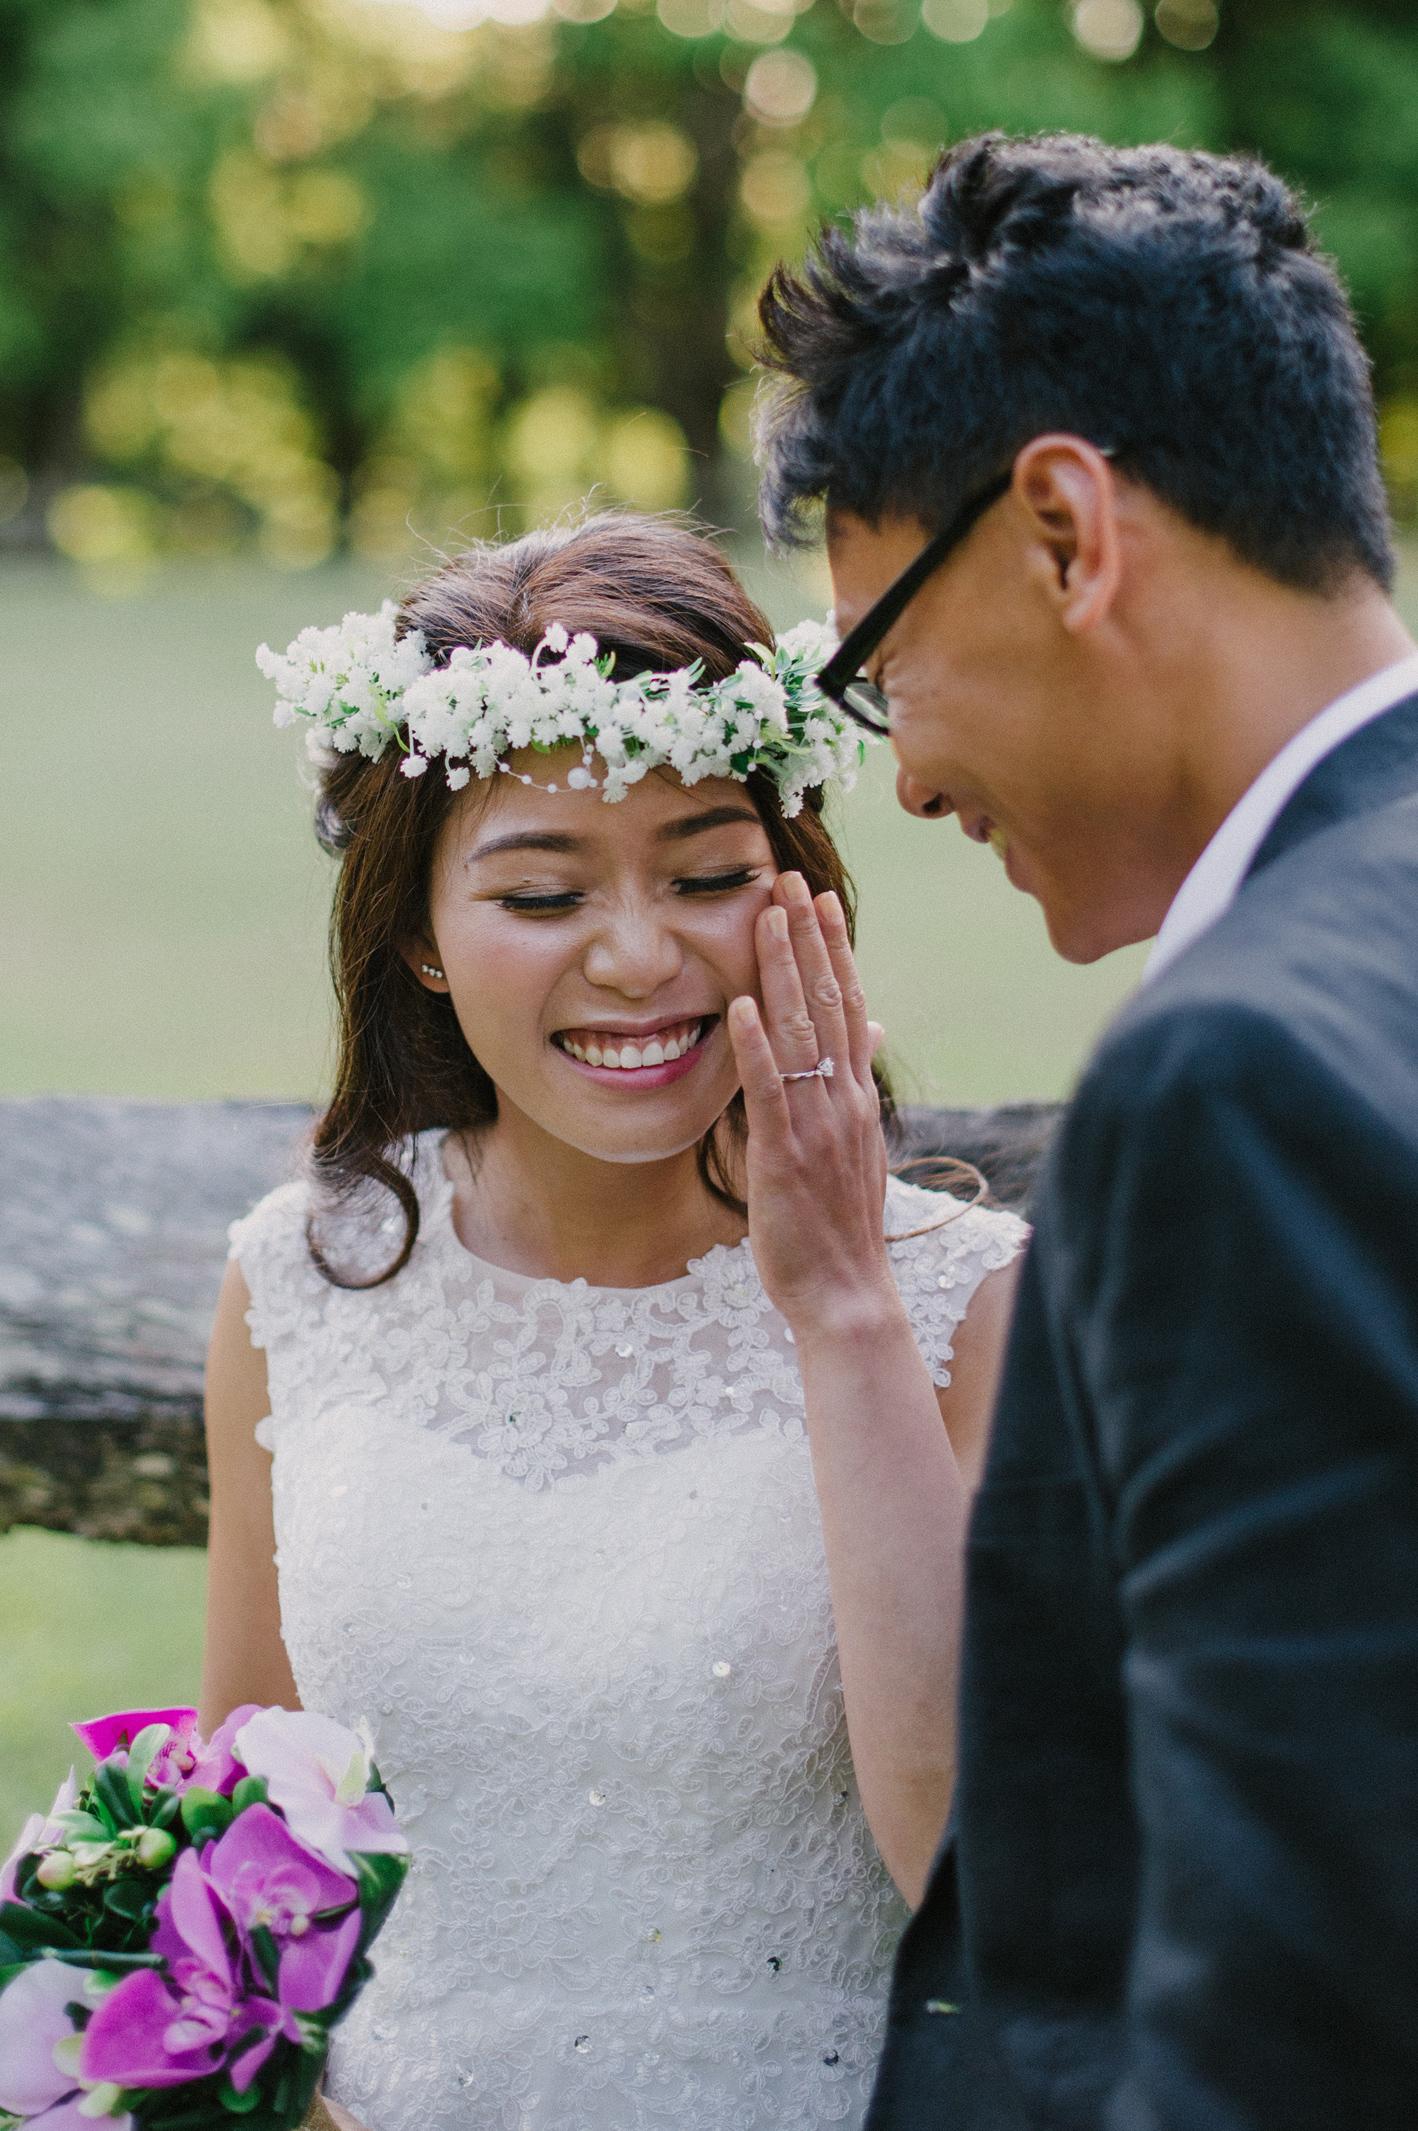 009-ed-janet-currumbin-wedding_sophie-baker-photography